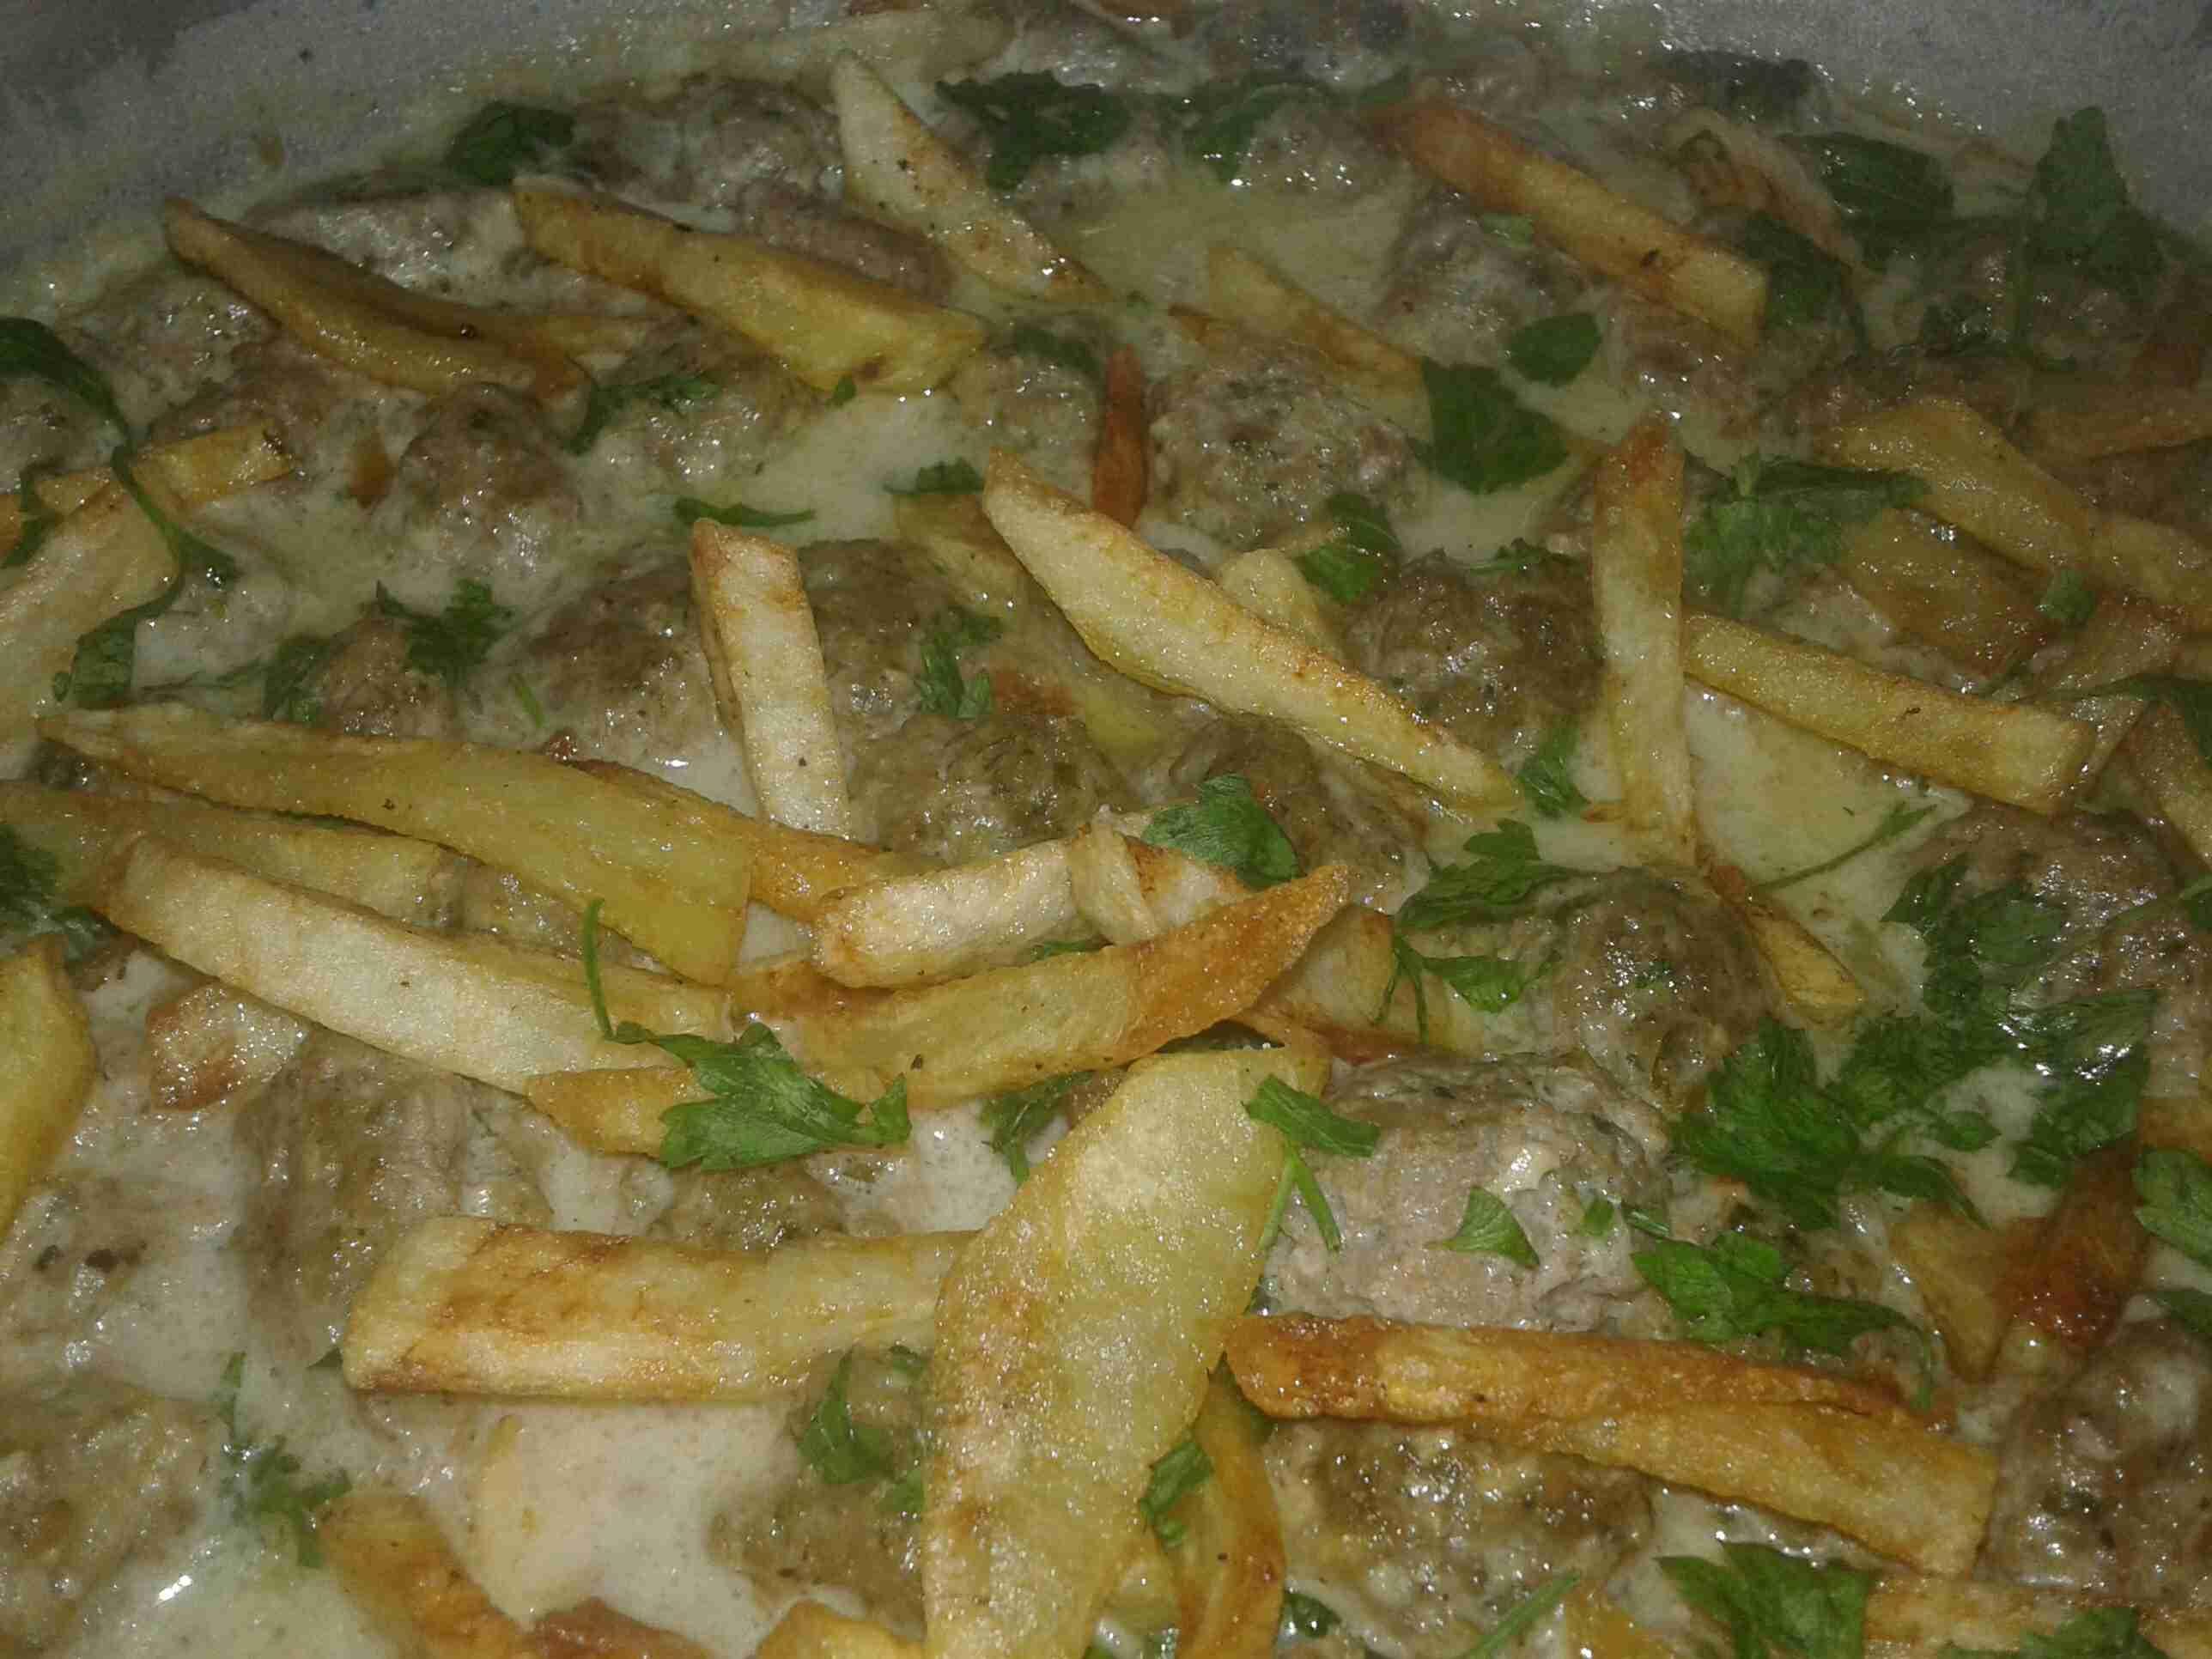 كفته بالطحينه و لبن الشنينه ولا اروع ملكة رمضان زاكي Recipe Main Dishes Food Vegetables